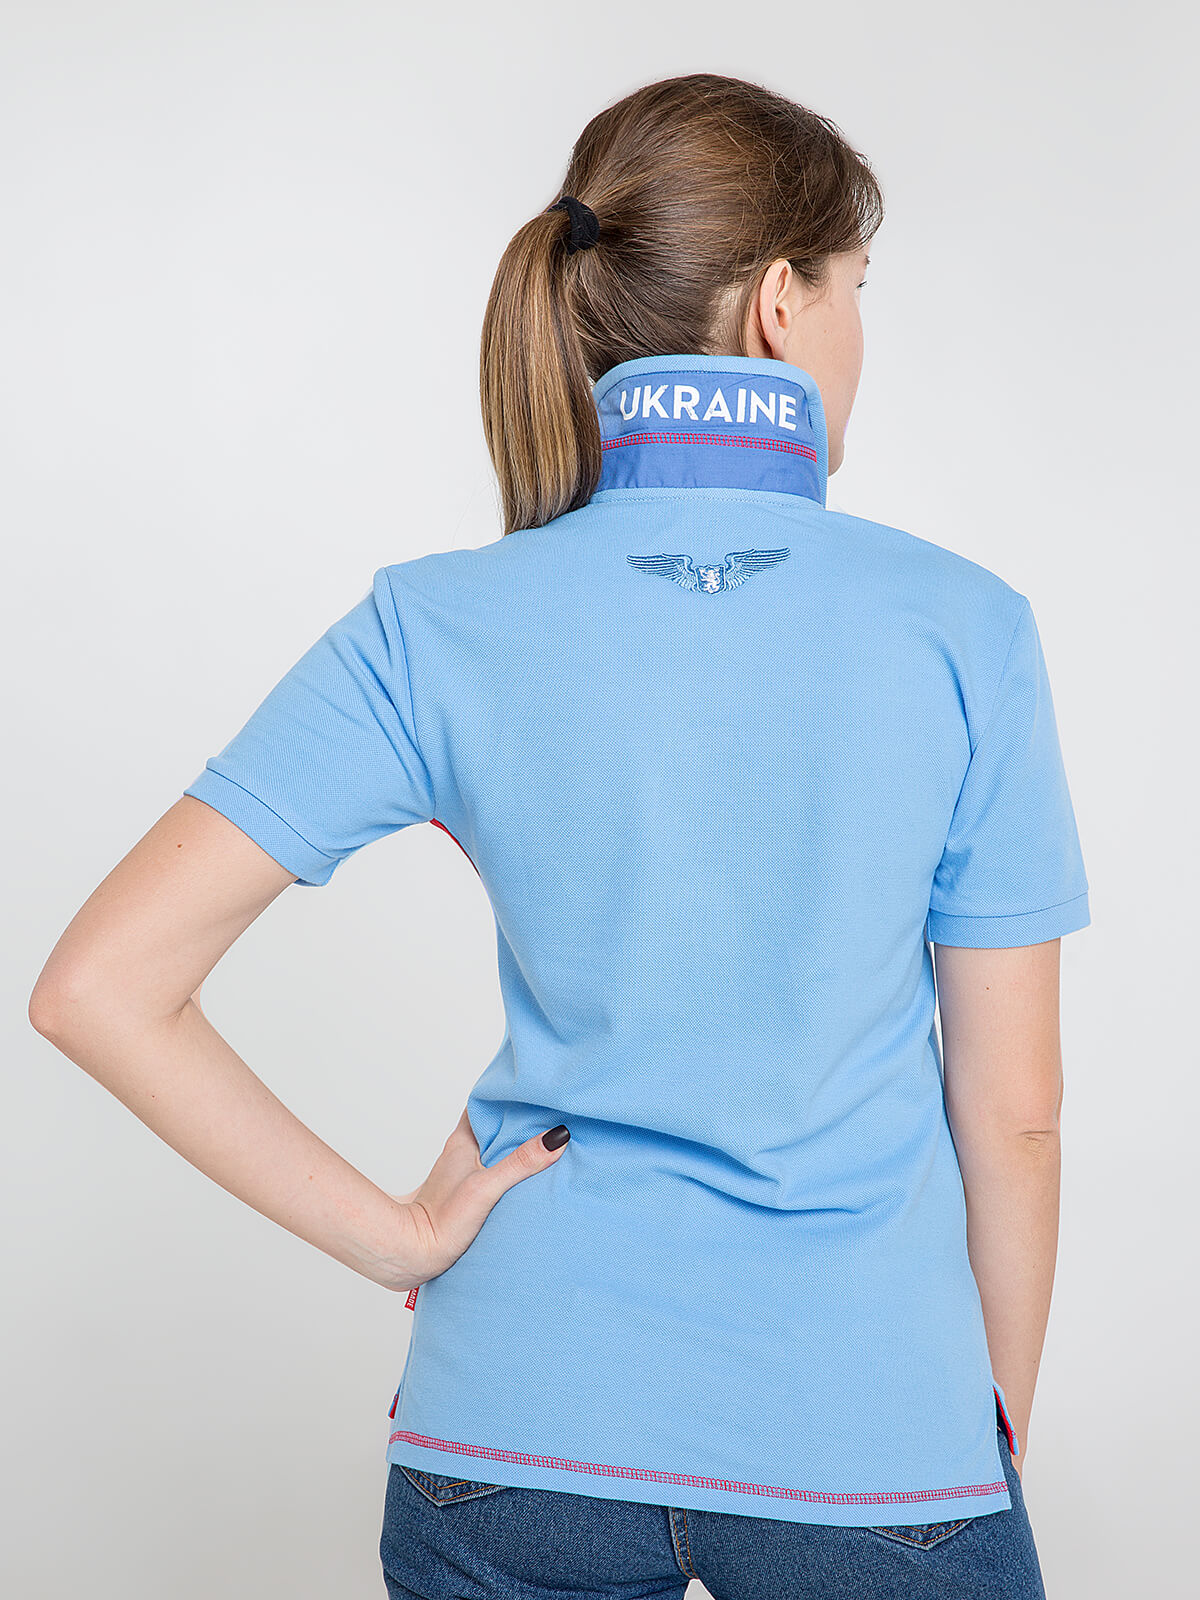 Women's Polo Shirt Wings. Color sky blue.  Pique fabric: 100% cotton.